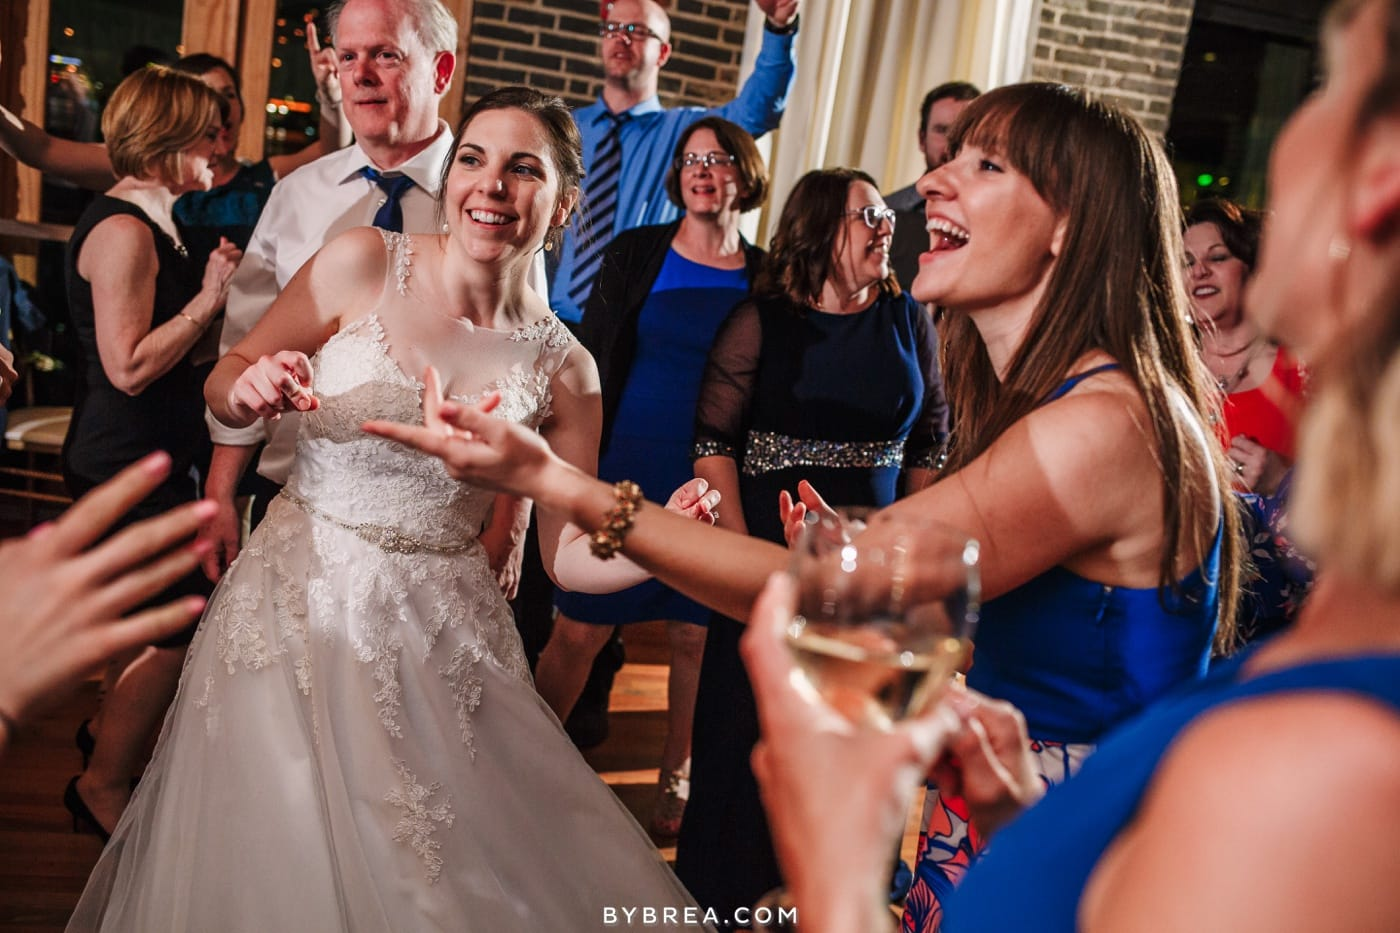 tracy-bharath-frederick-douglass-baltimore-wedding-photos_0302